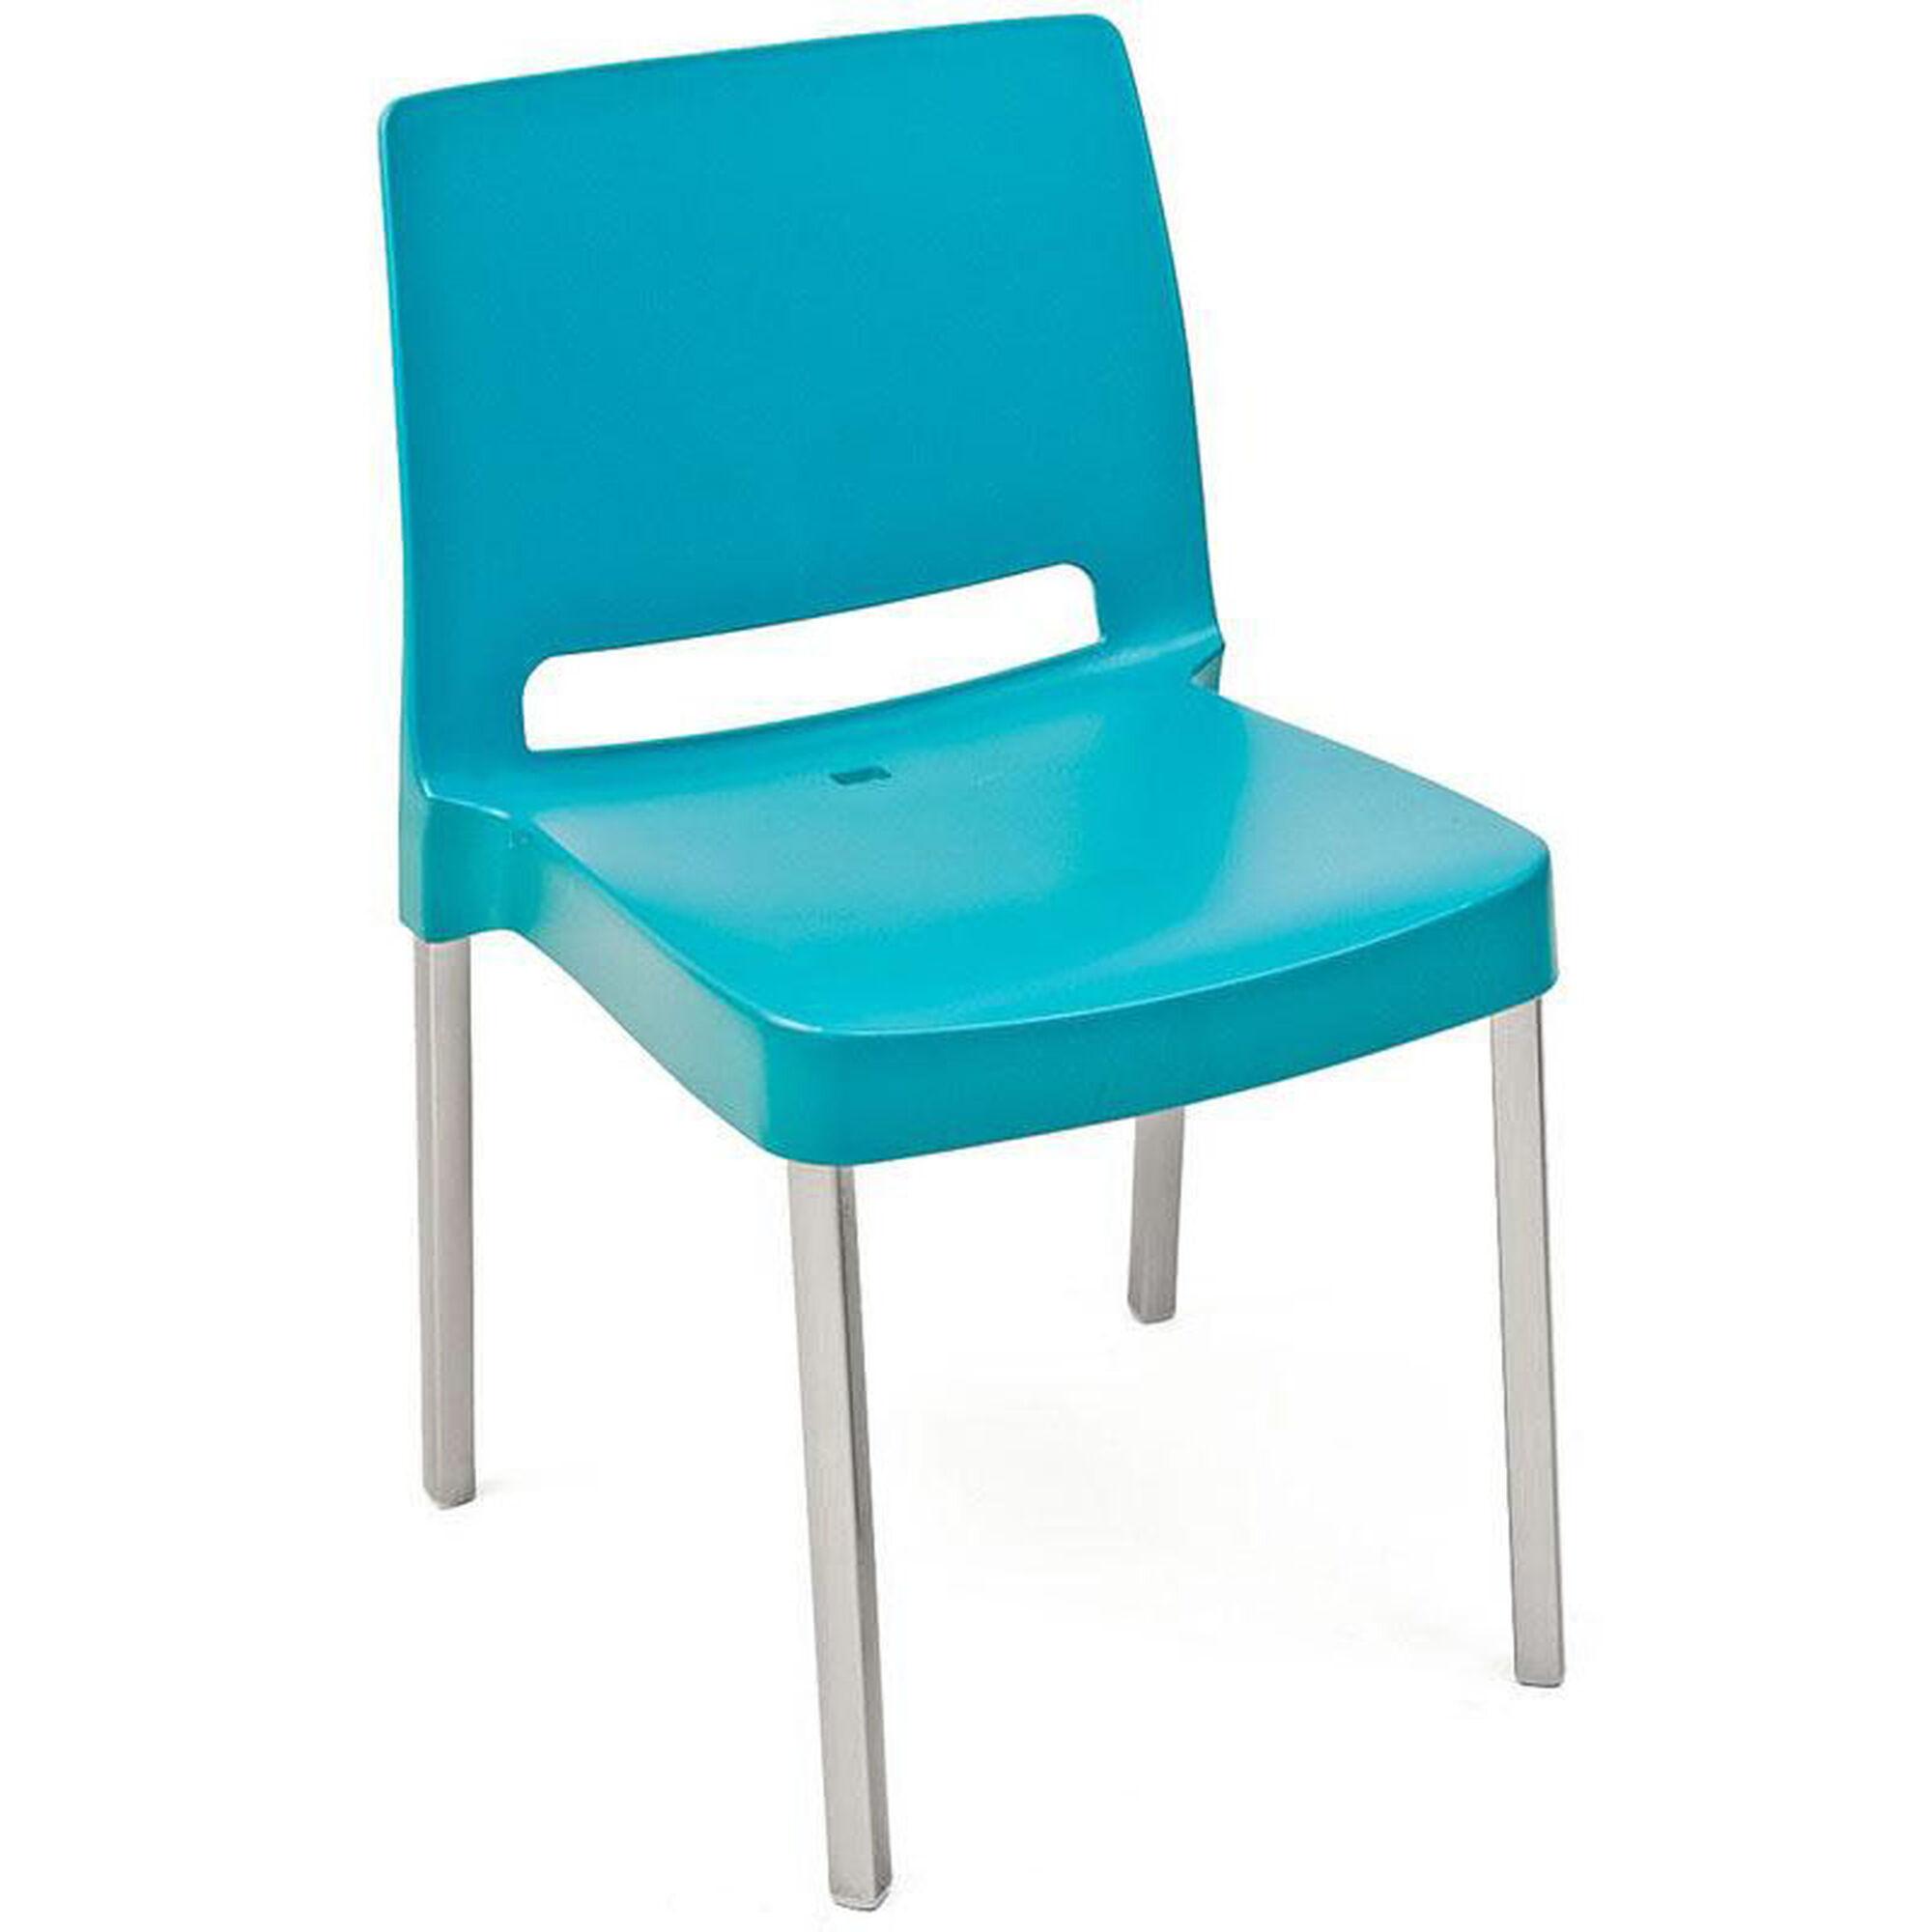 Peachy Pedrali Stackable Poly Shell Outdoor Chair In Aqua Inzonedesignstudio Interior Chair Design Inzonedesignstudiocom